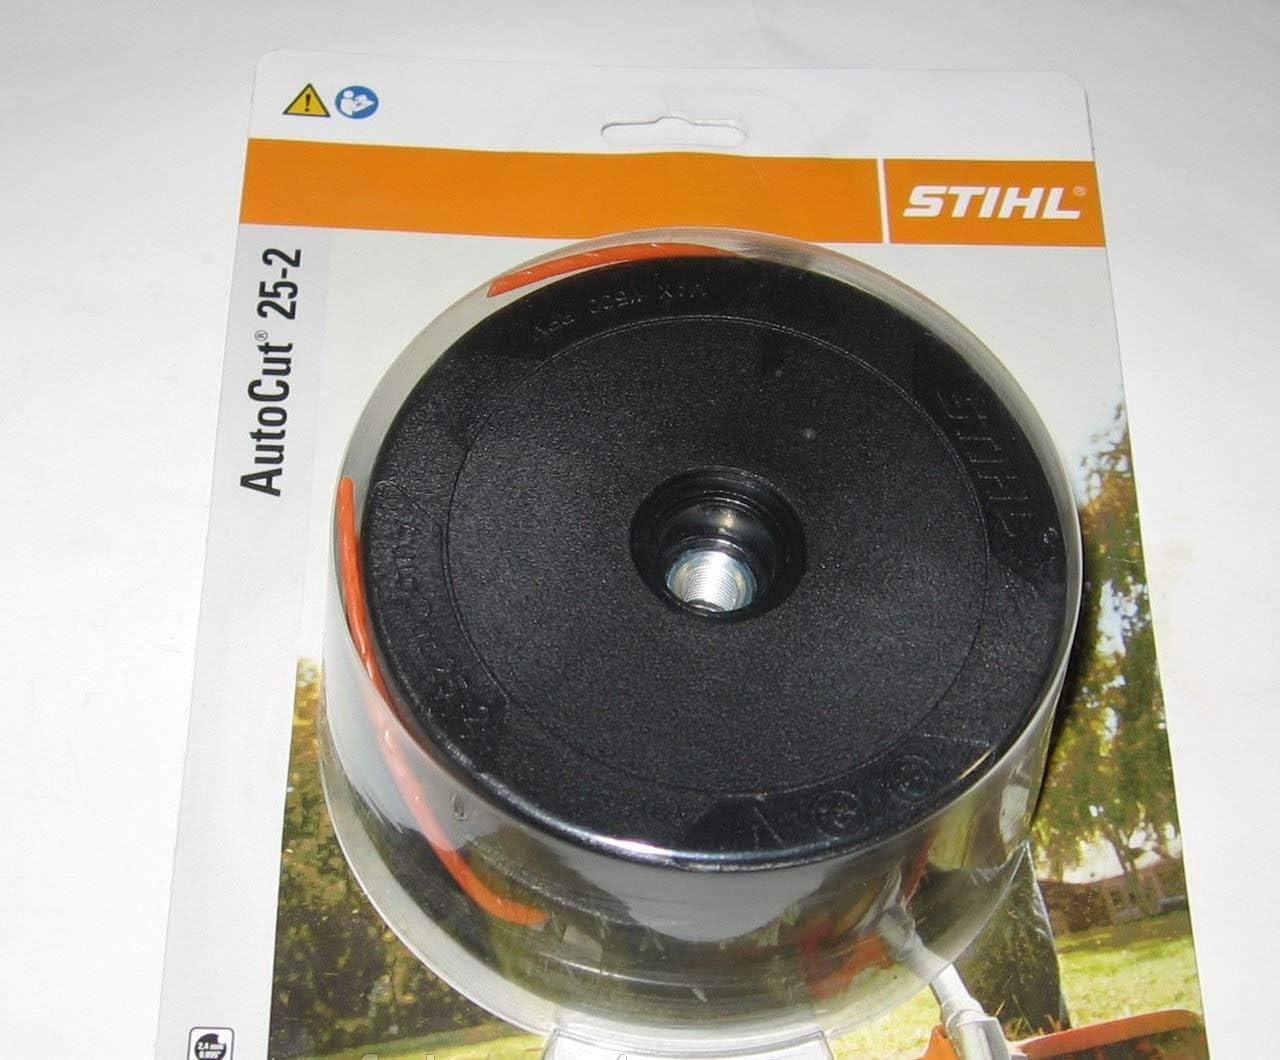 Improved Stihl Autocut 25.2 Trimmer Head